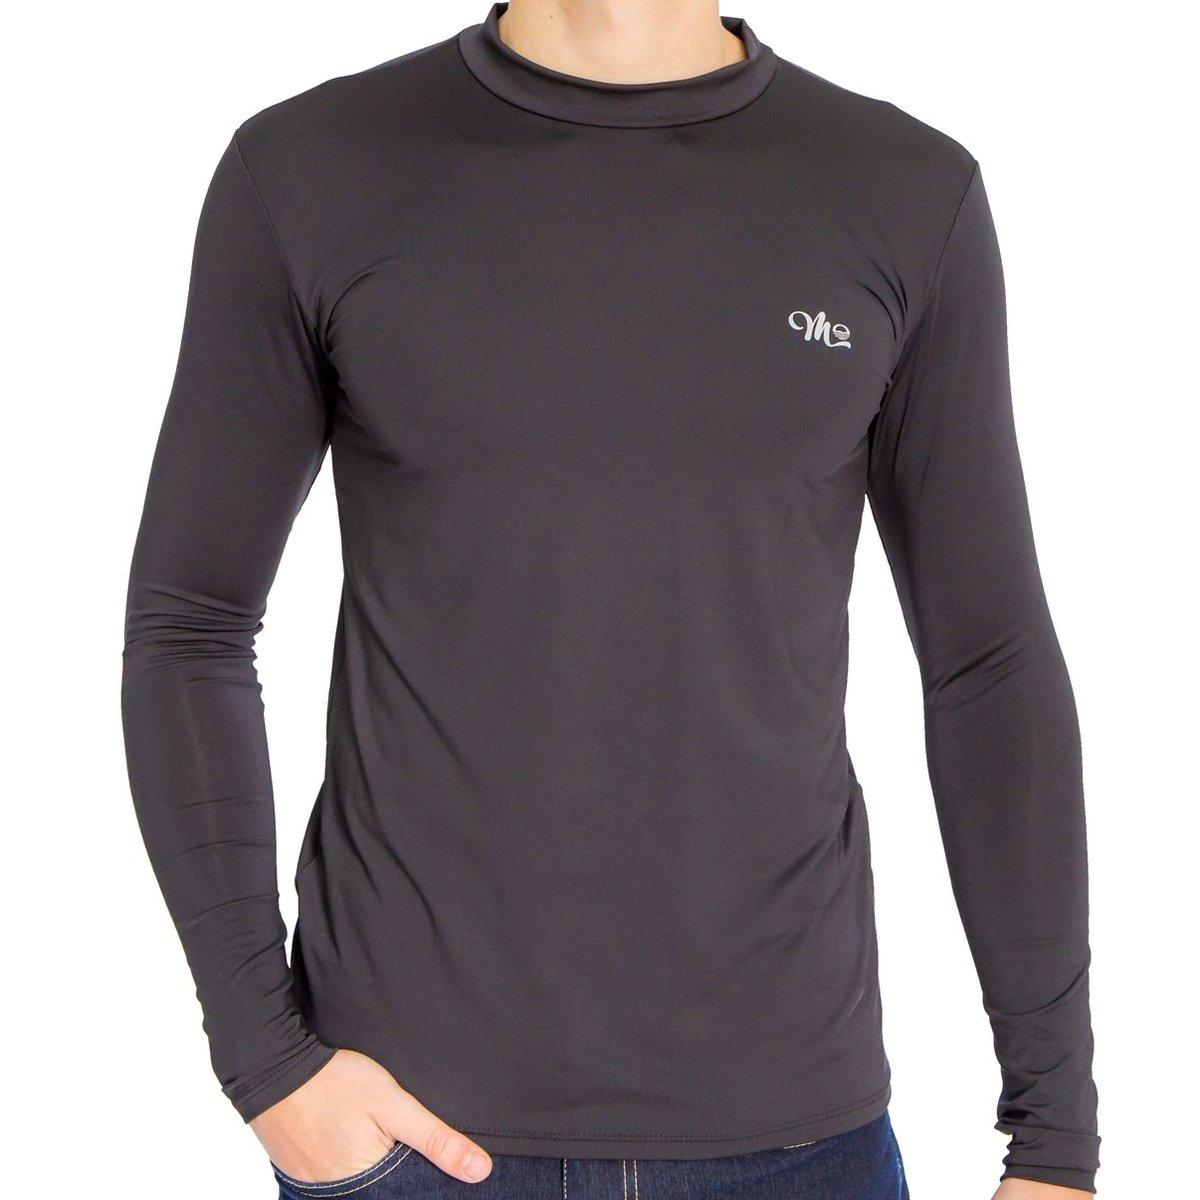 45a528fd90ee9 Camiseta Térmica Manga Longa Masculina - Preto - Compre Agora